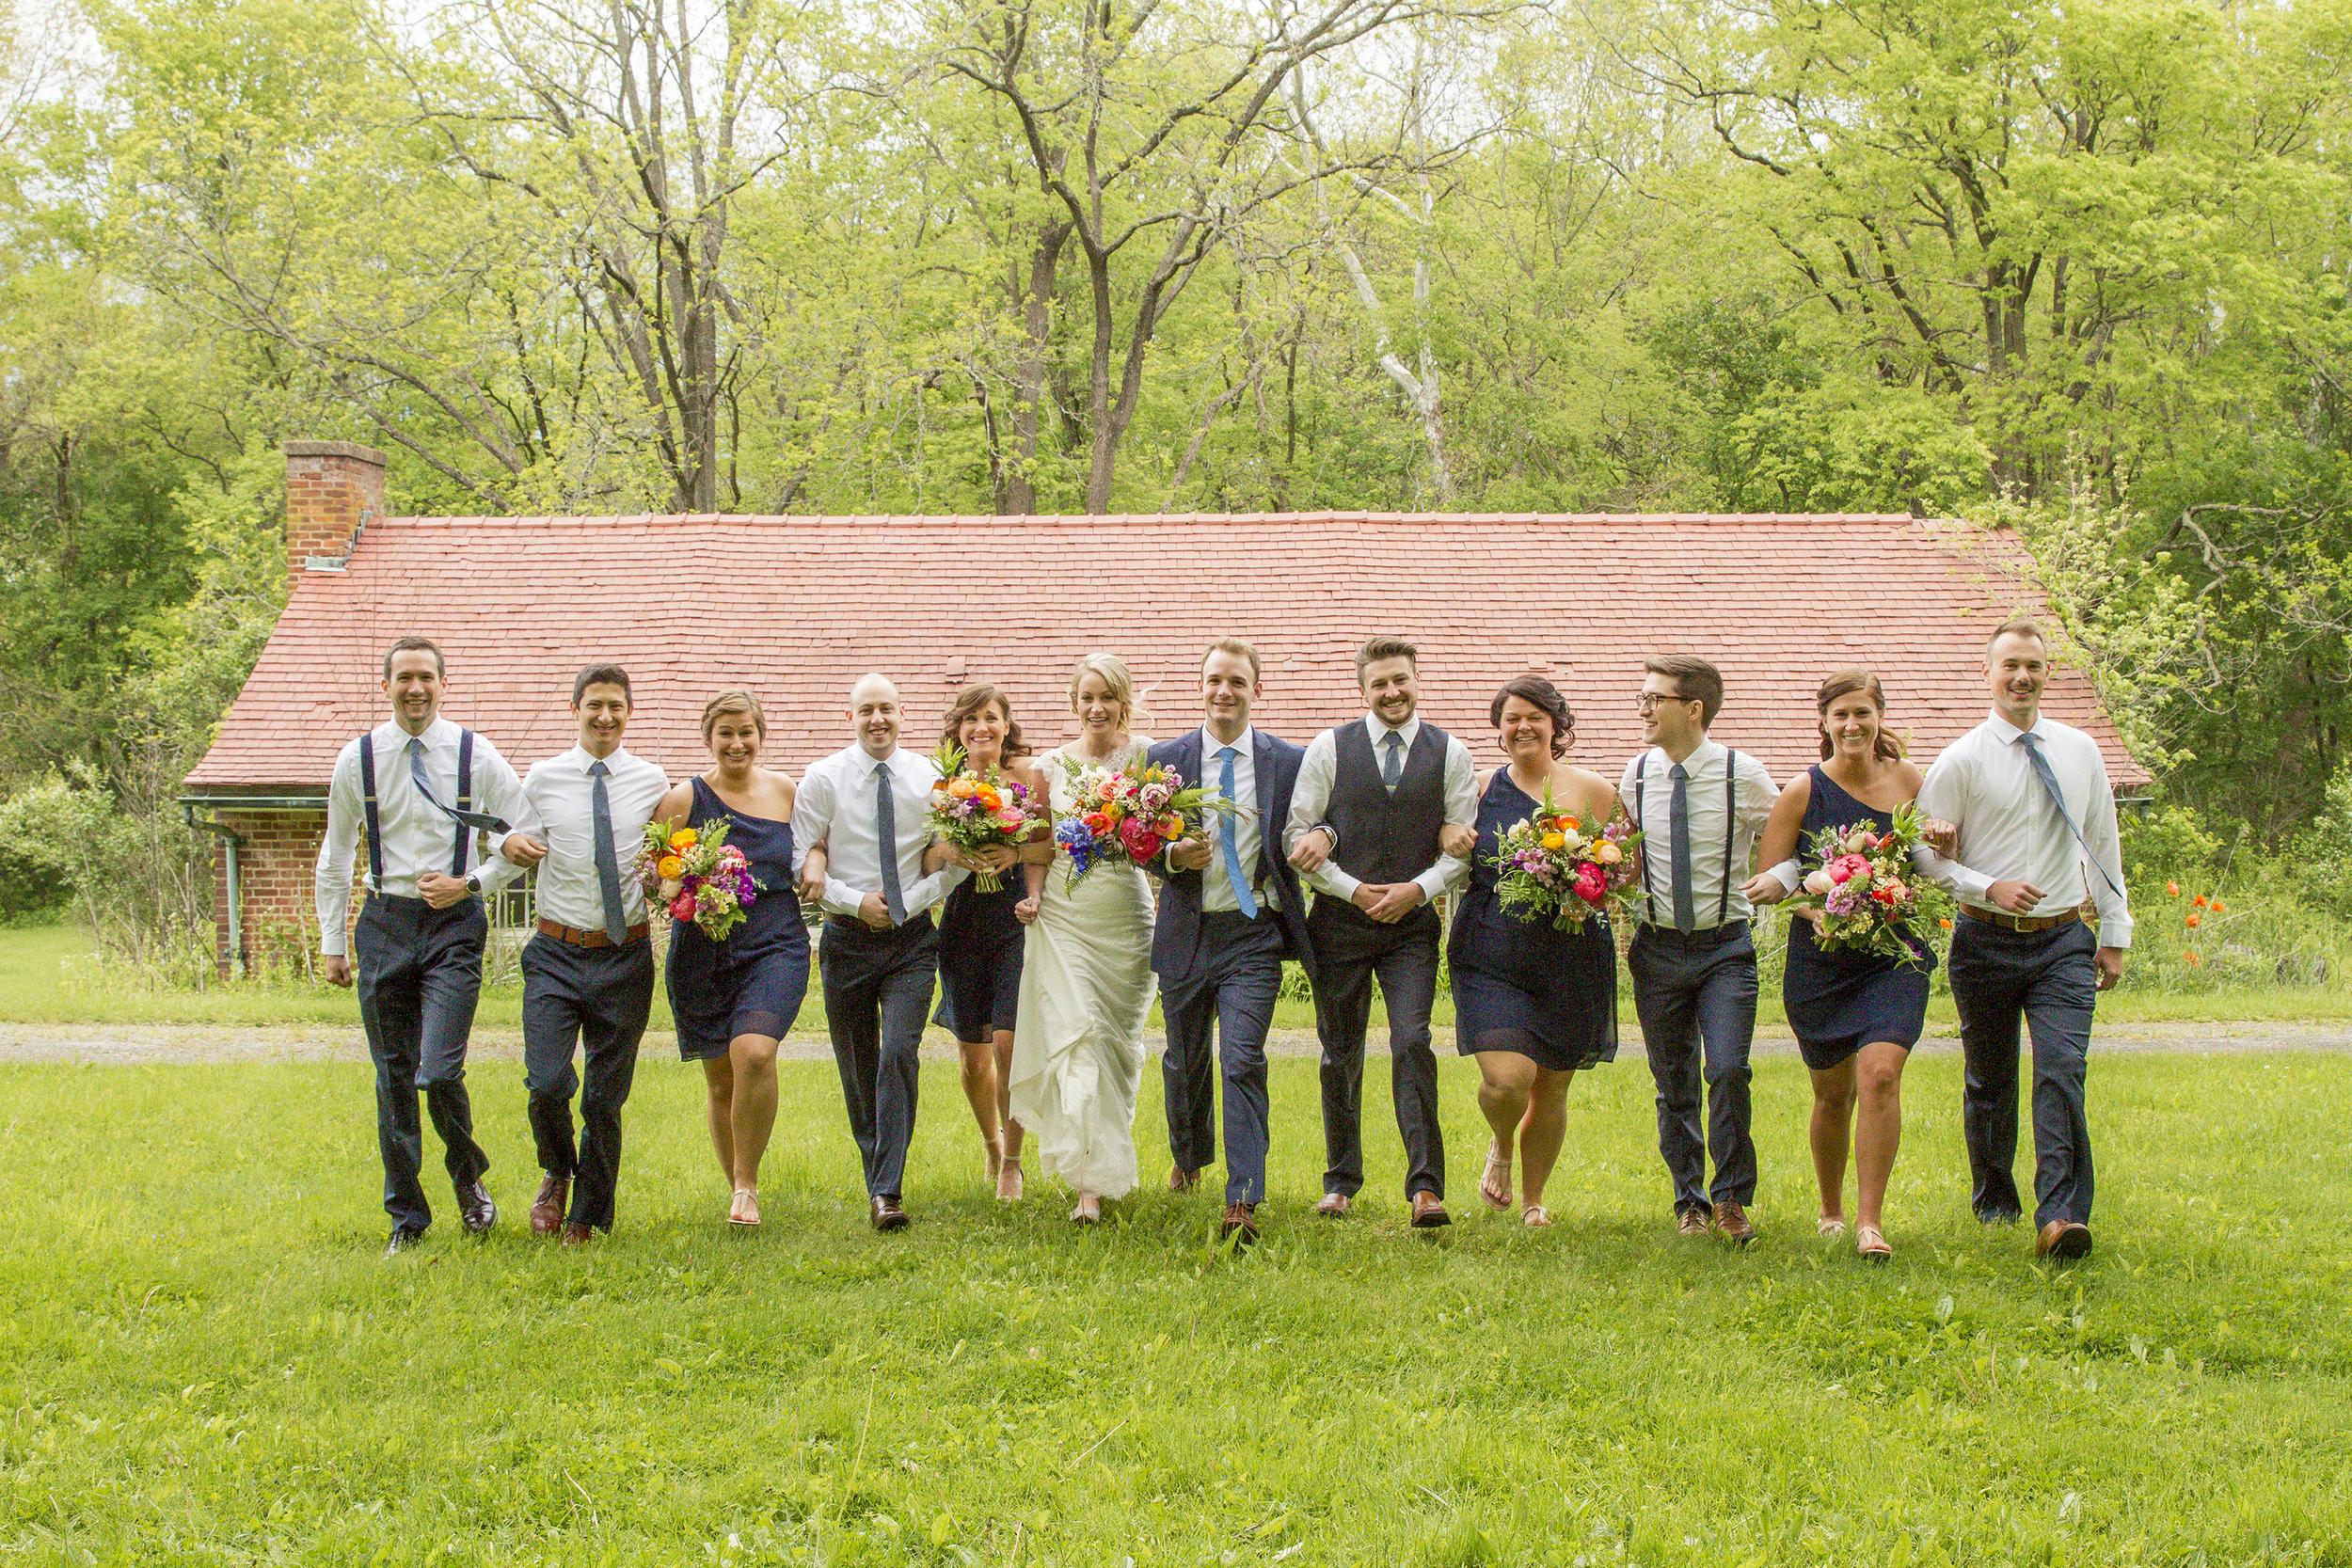 WEDDING_PARTY-42 copy.jpg